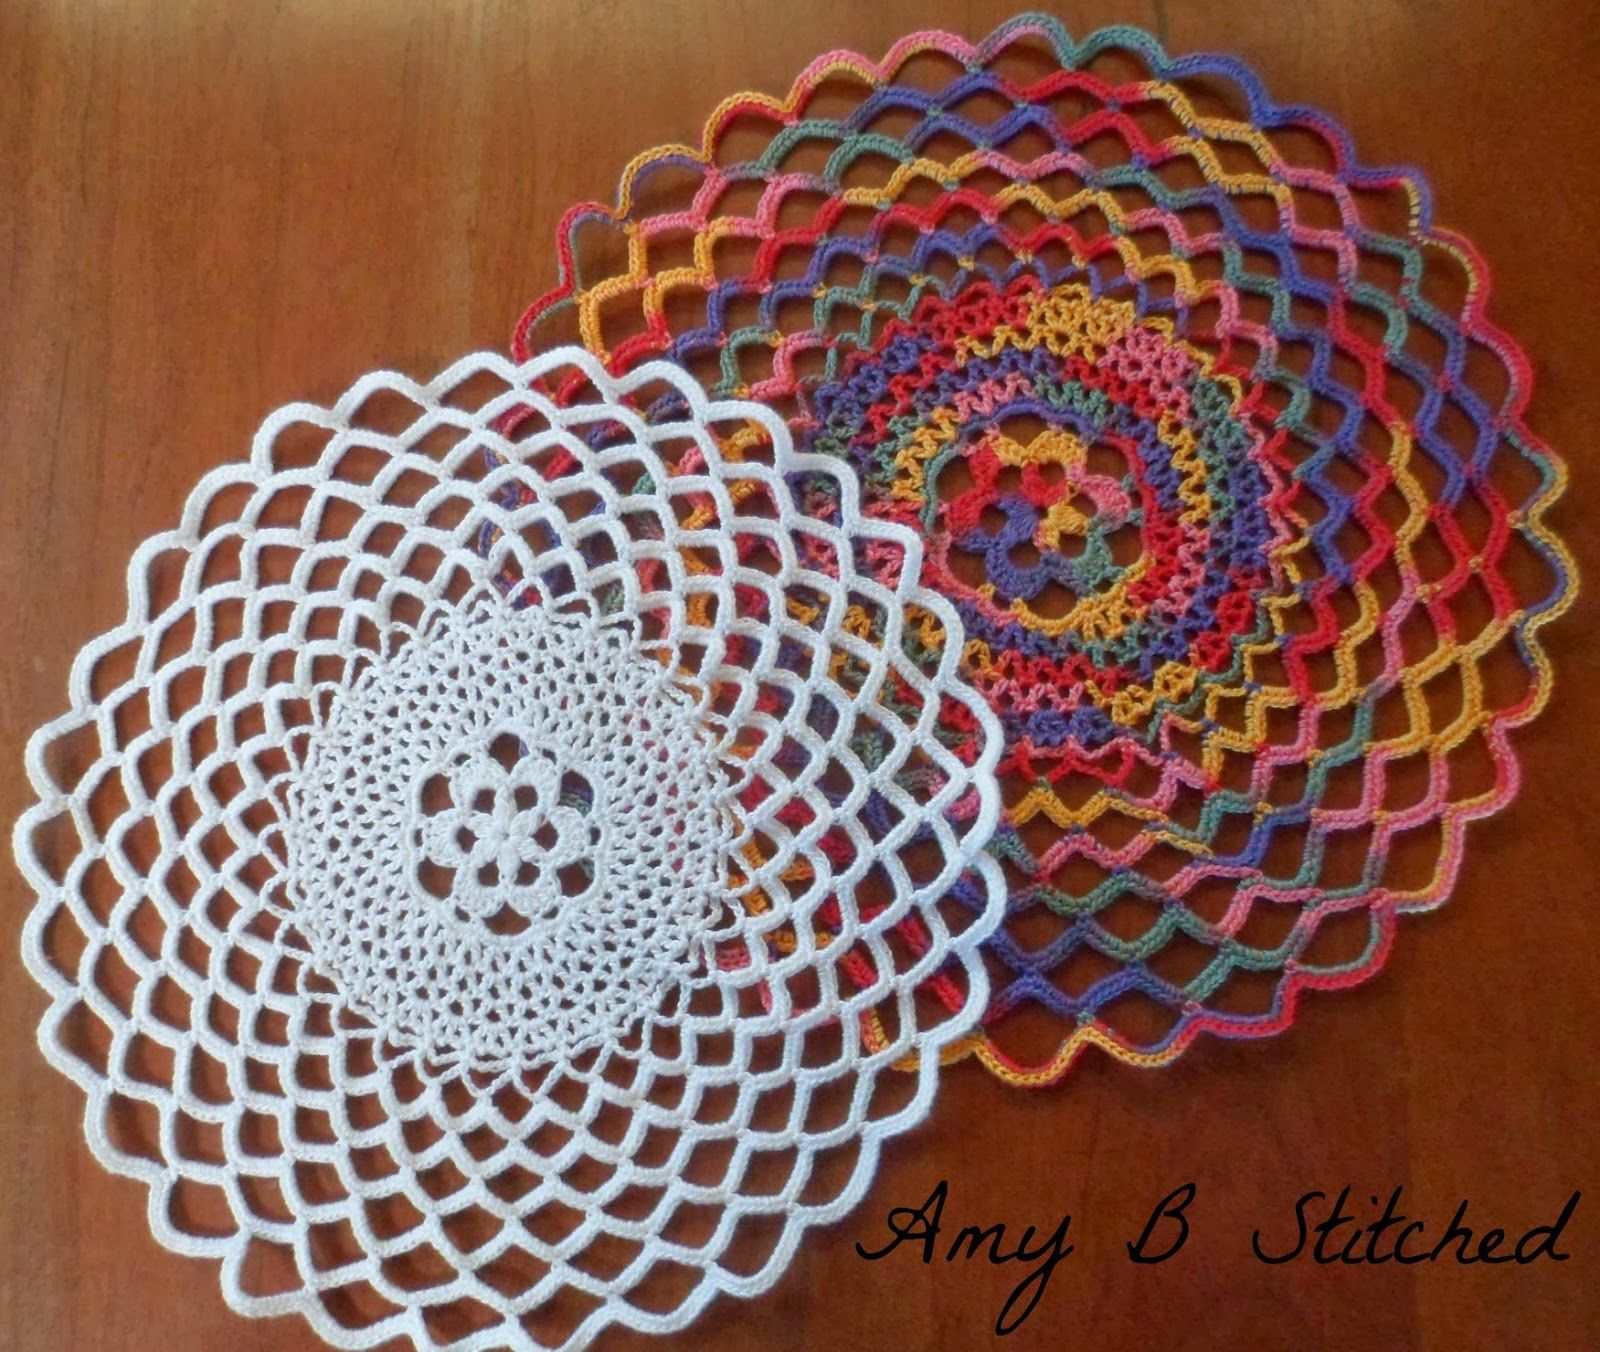 Swirling Doily